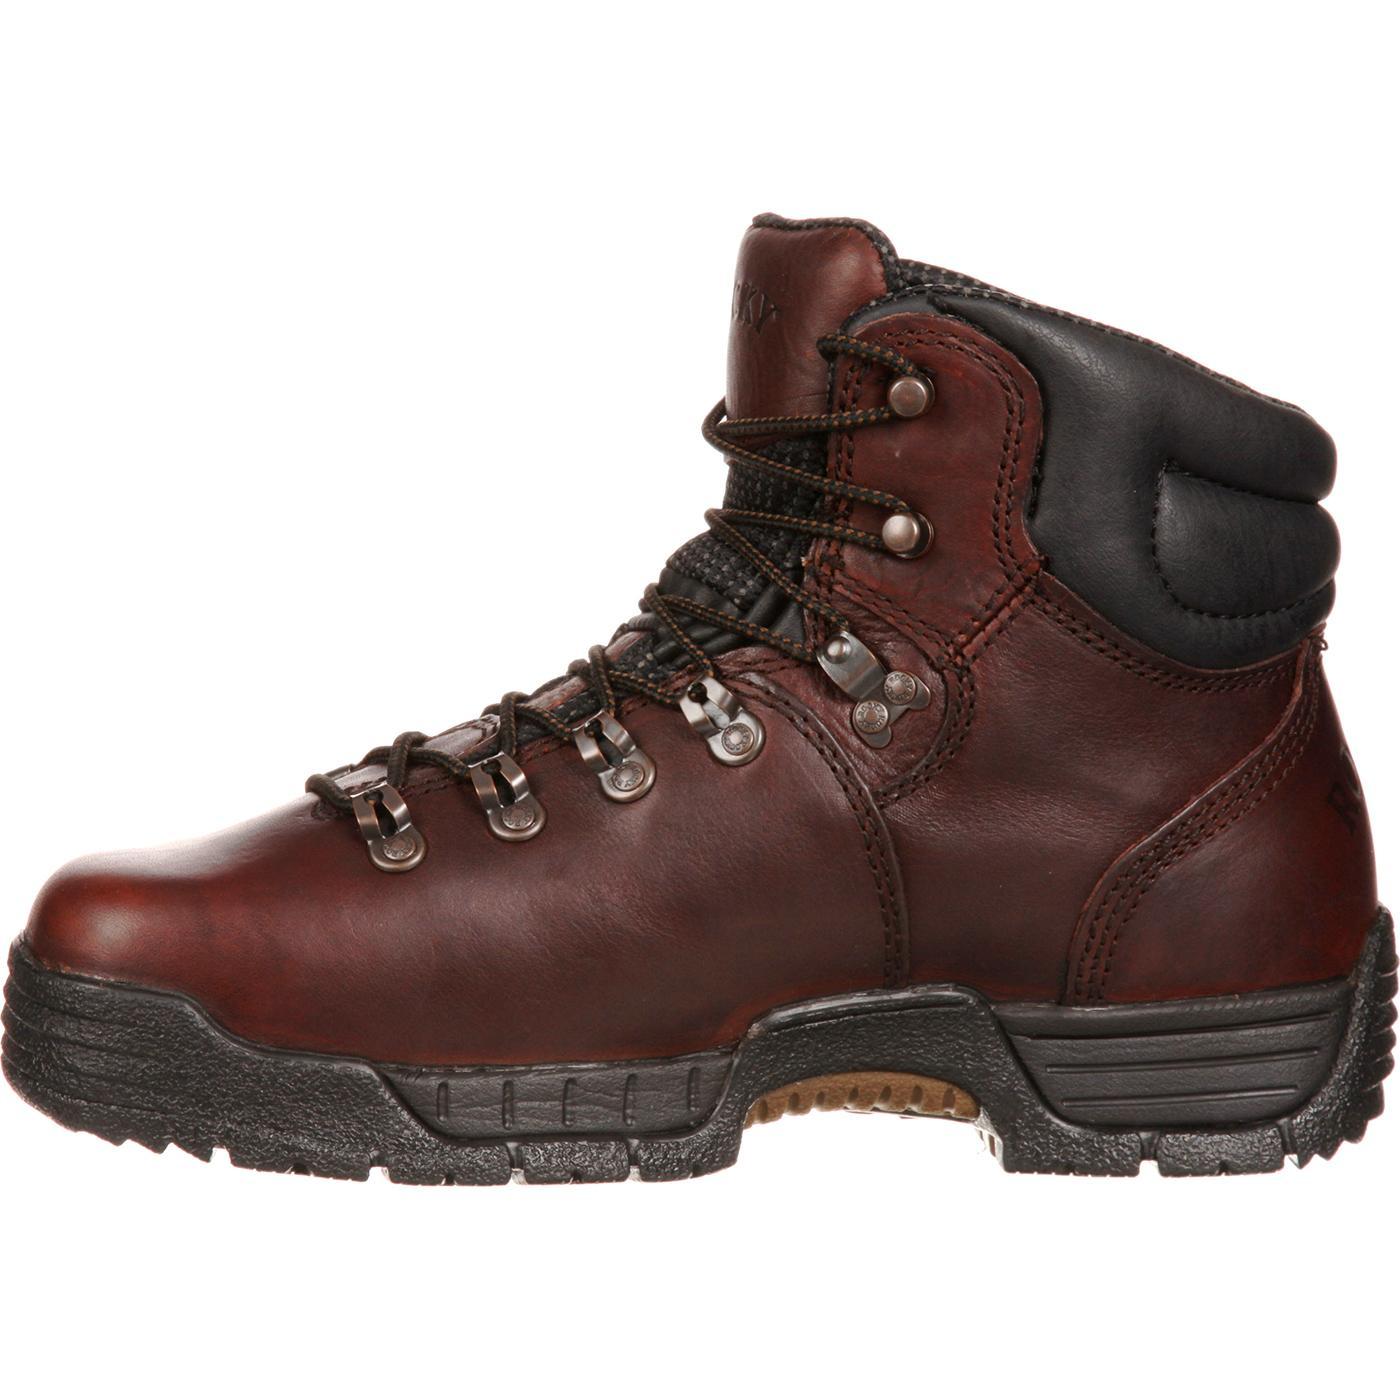 Rocky MobiLite Men's Waterproof Work Boots, Style #7114